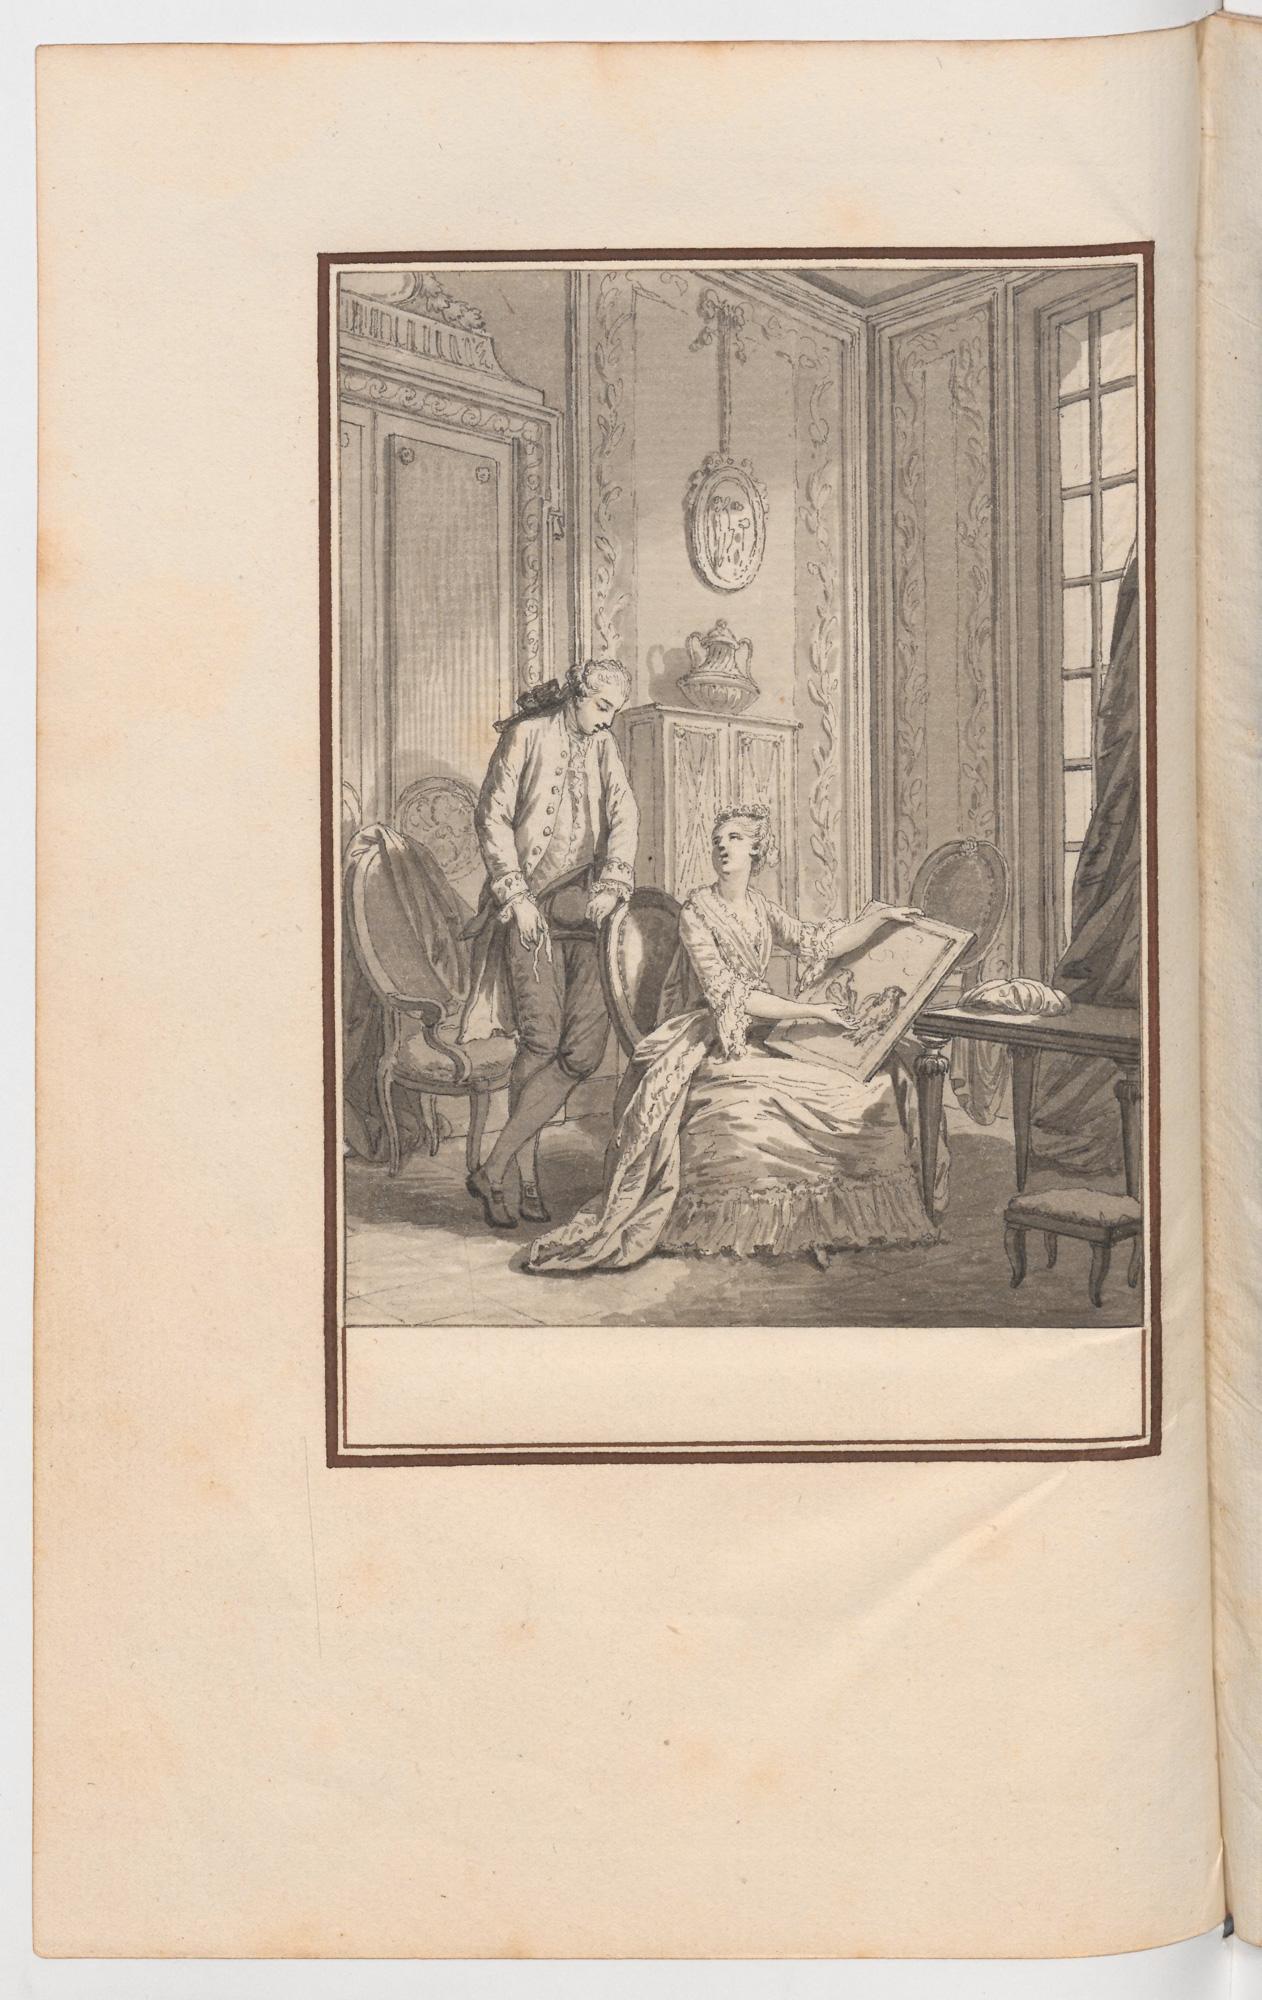 S.3.05 La leçon, Chantilly, Image